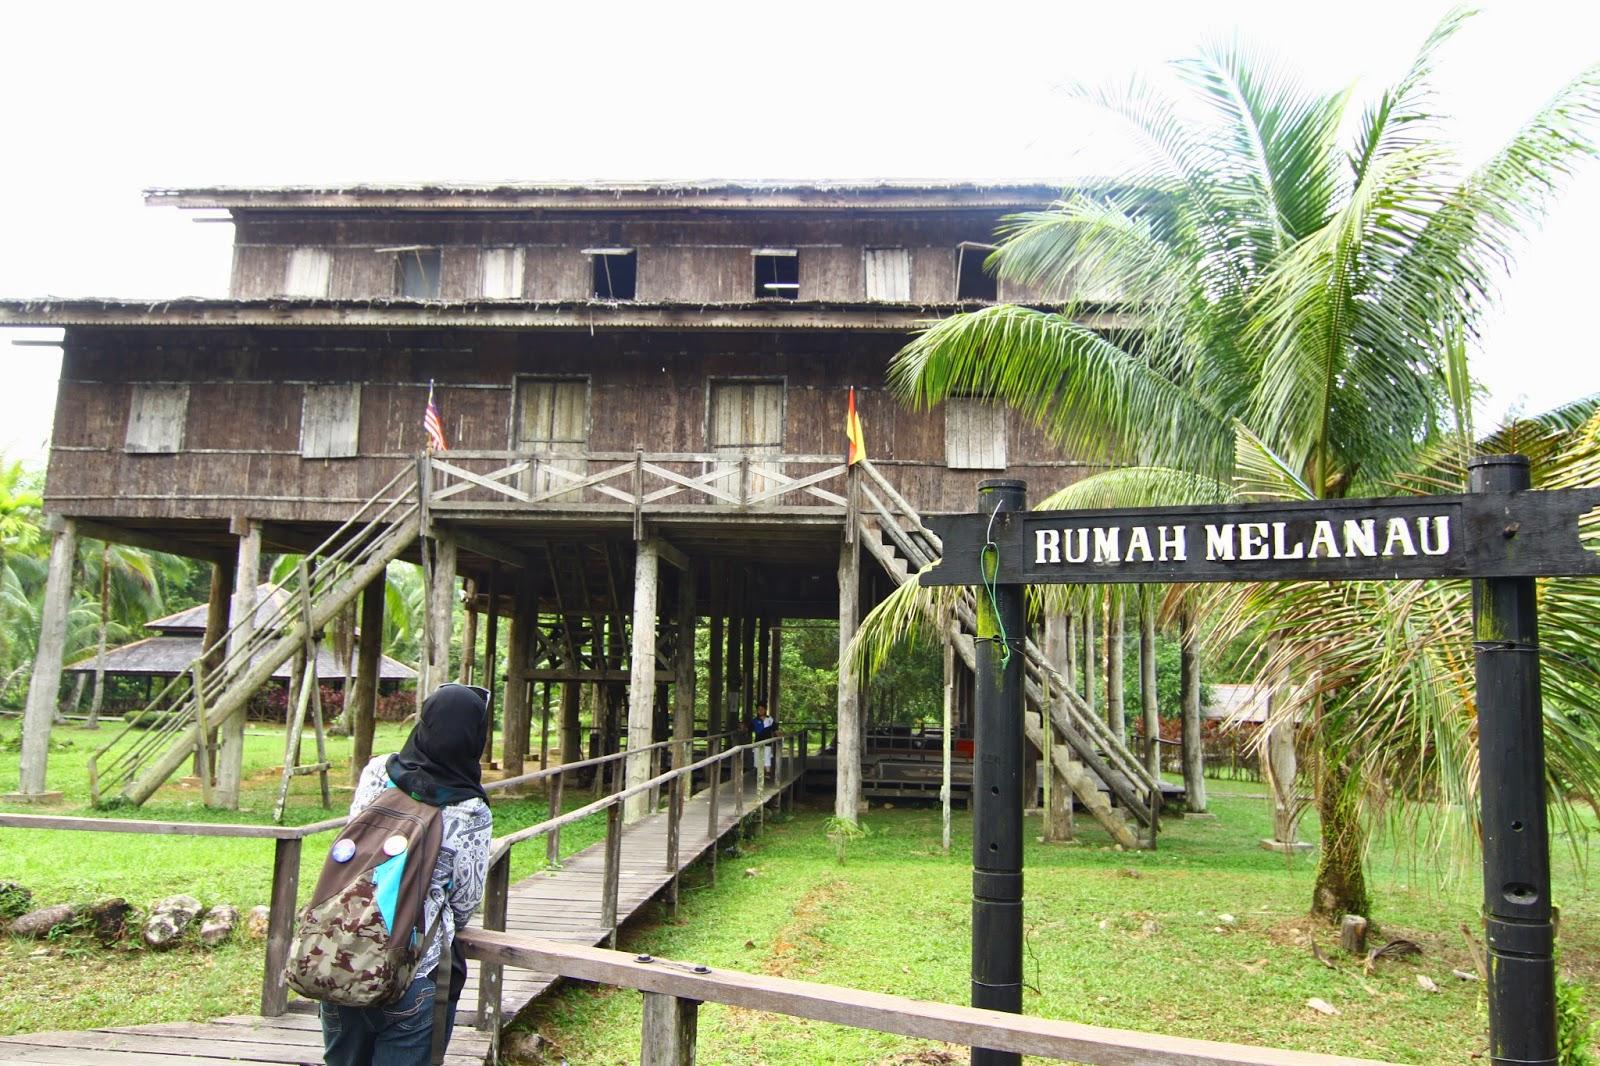 Rumah Melanau Kampung Budaya Sarawak